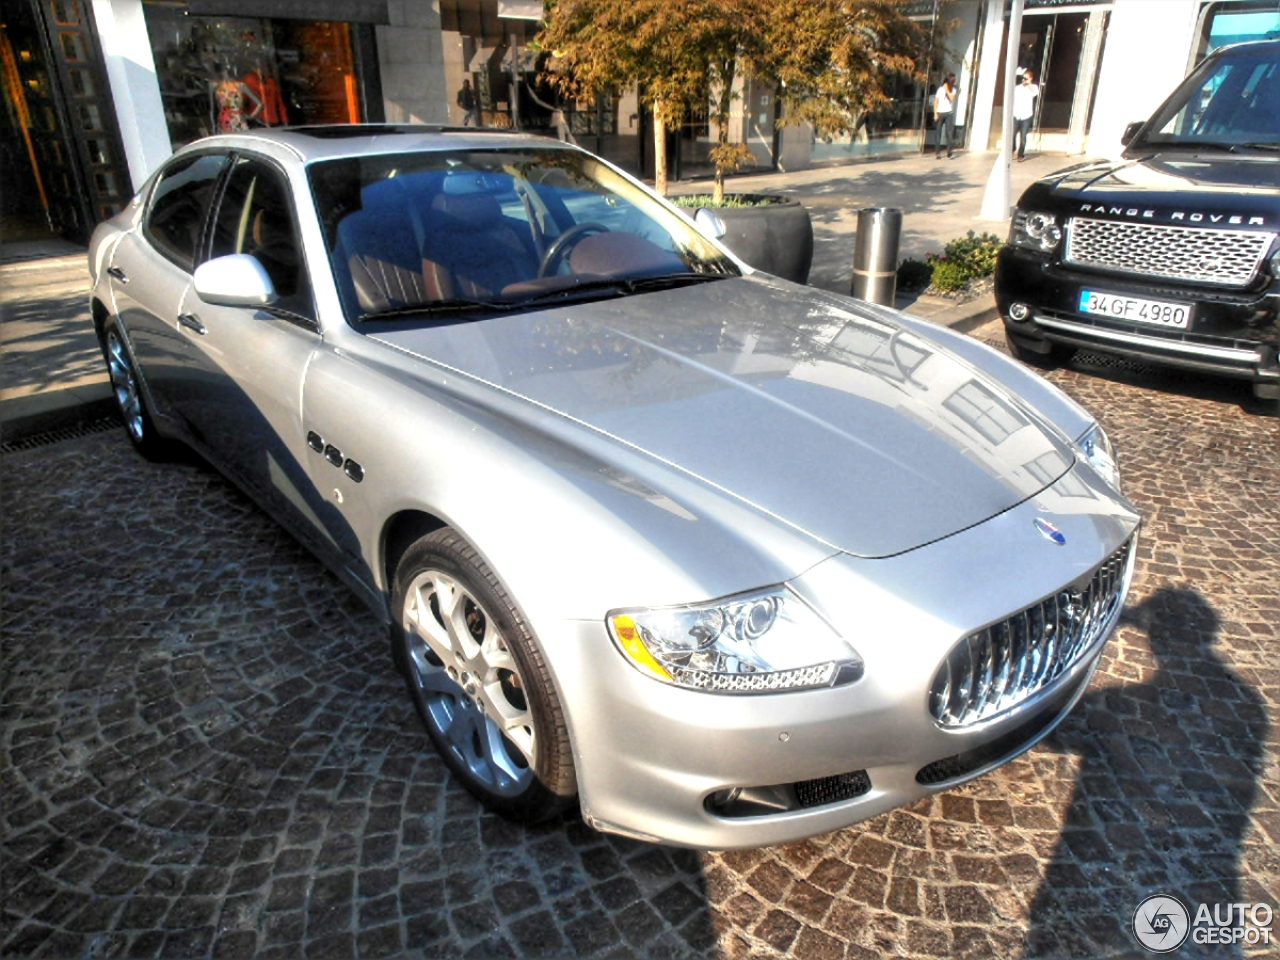 Maserati Quattroporte 2008 - 28 september 2014 - Autogespot